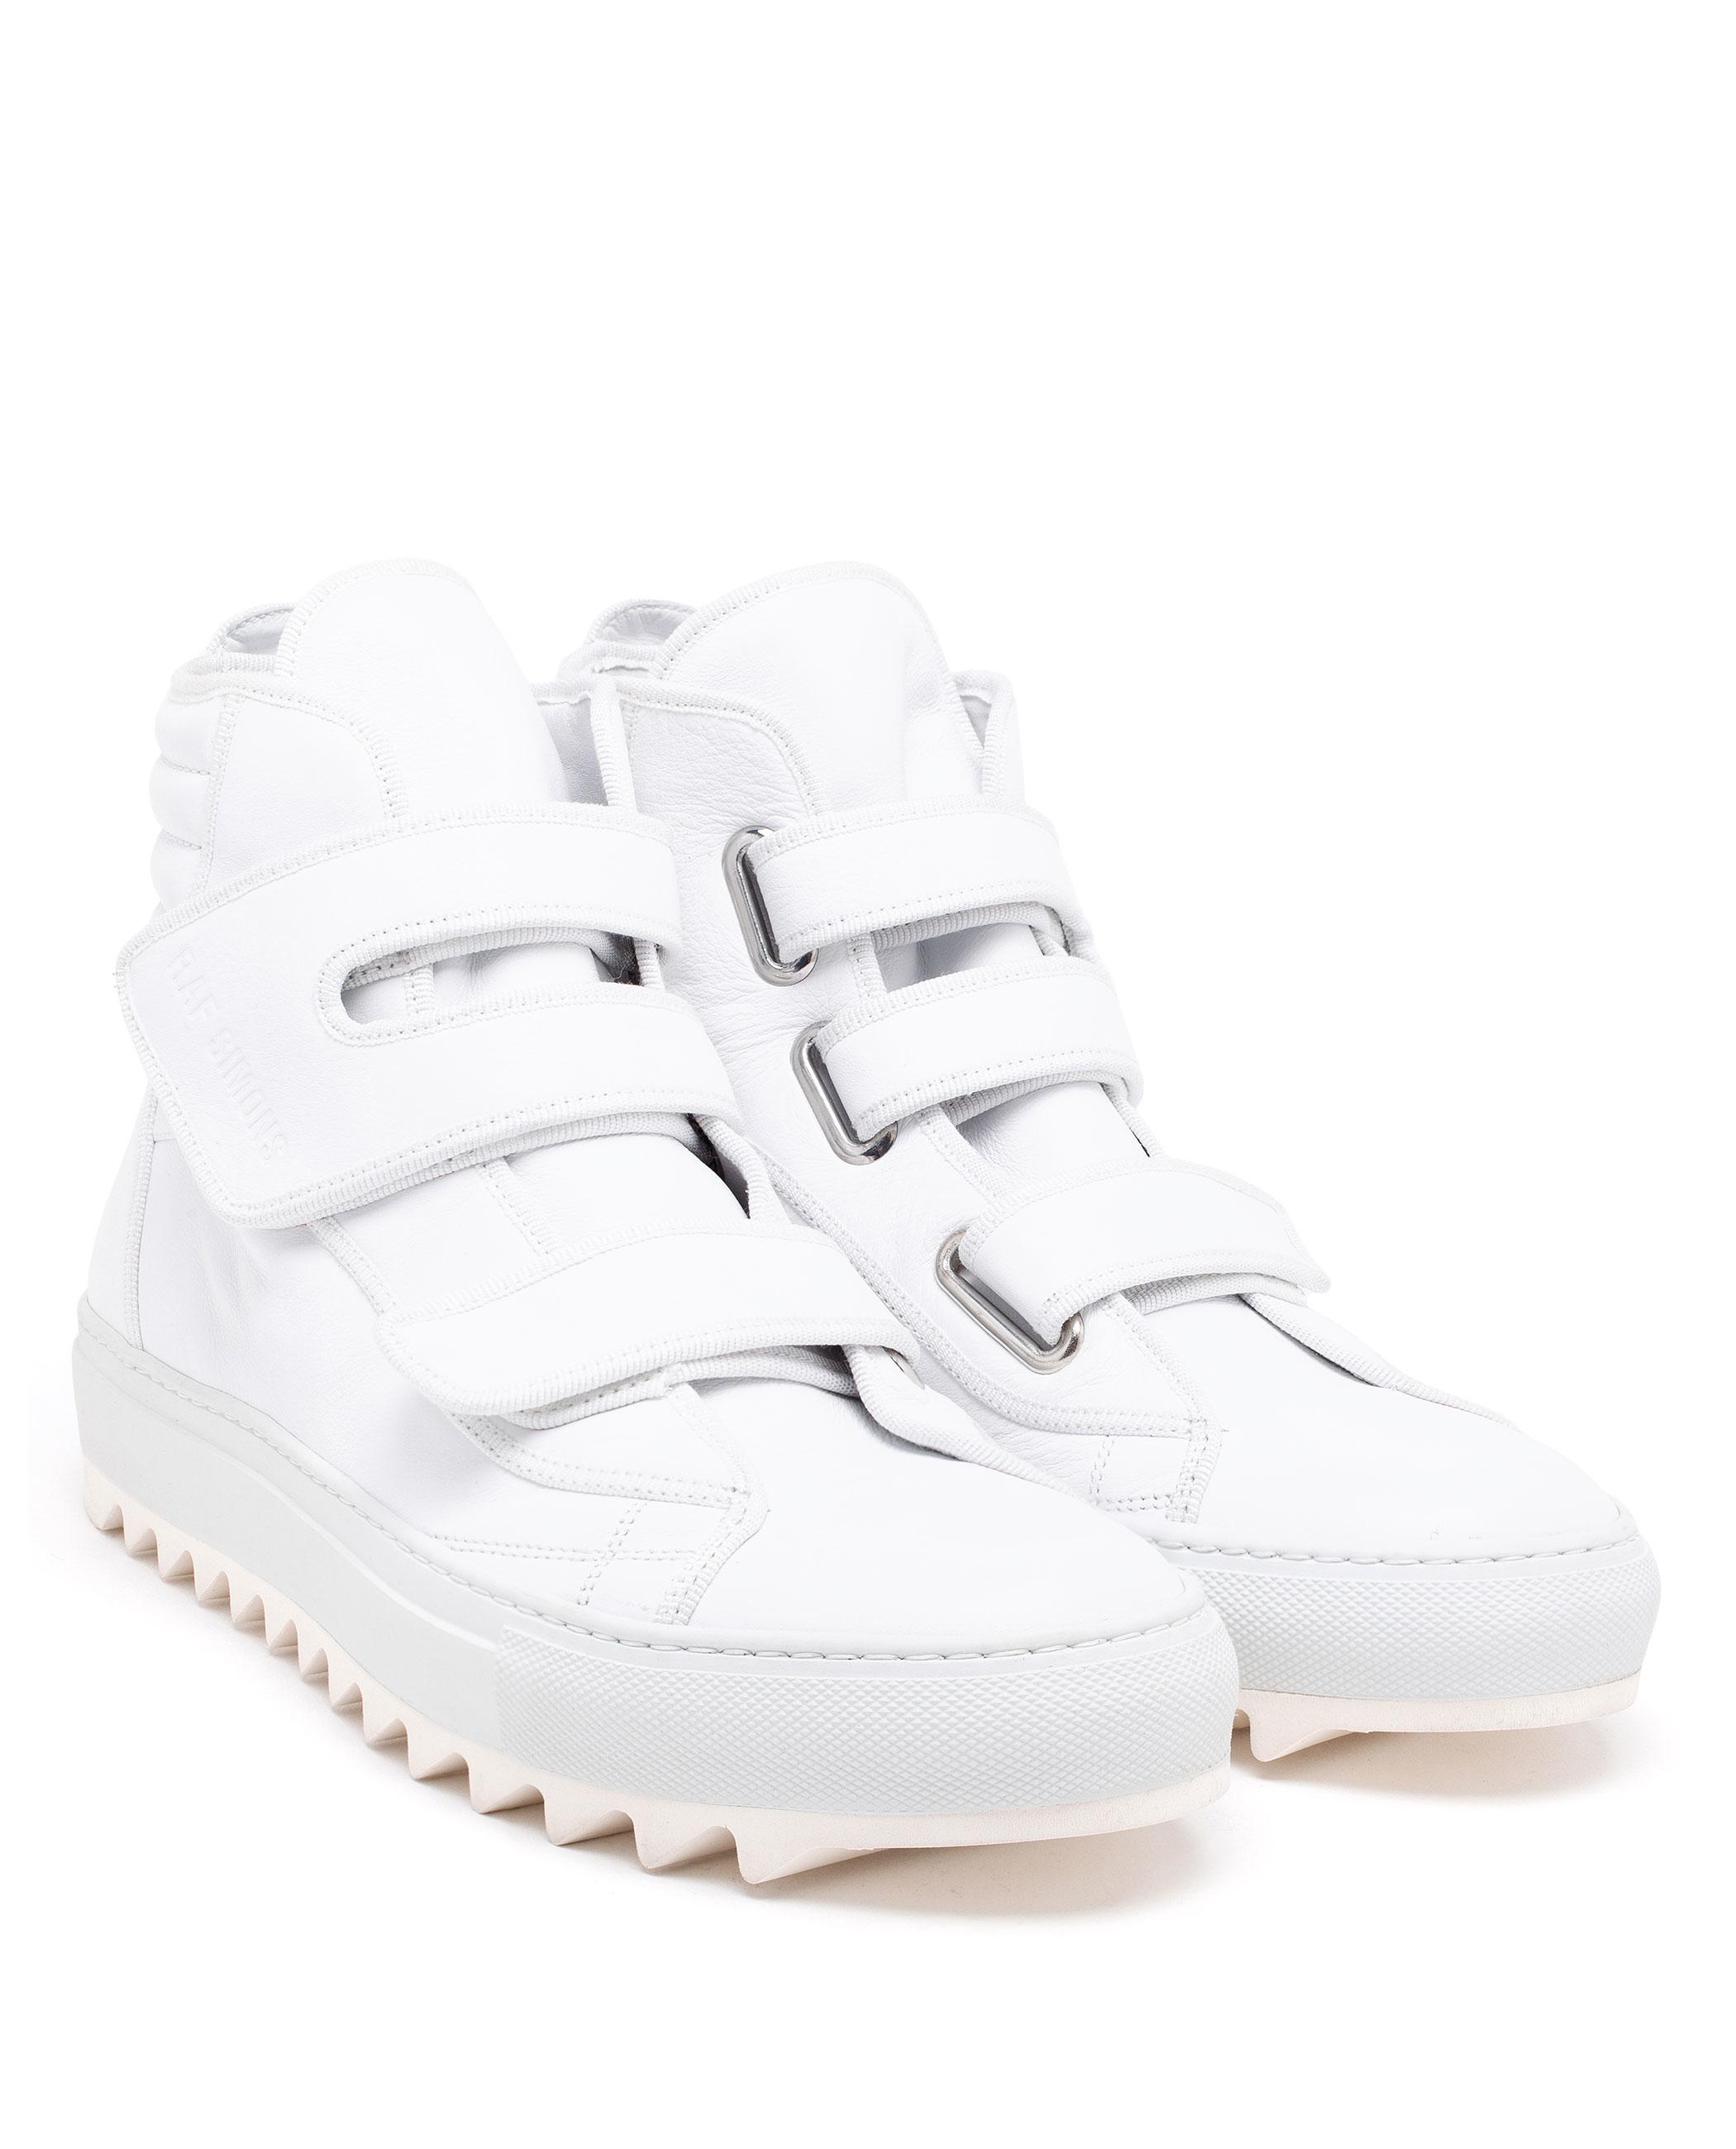 9c38125887c6 Lyst - Raf Simons White Leather High-tops in White for Men